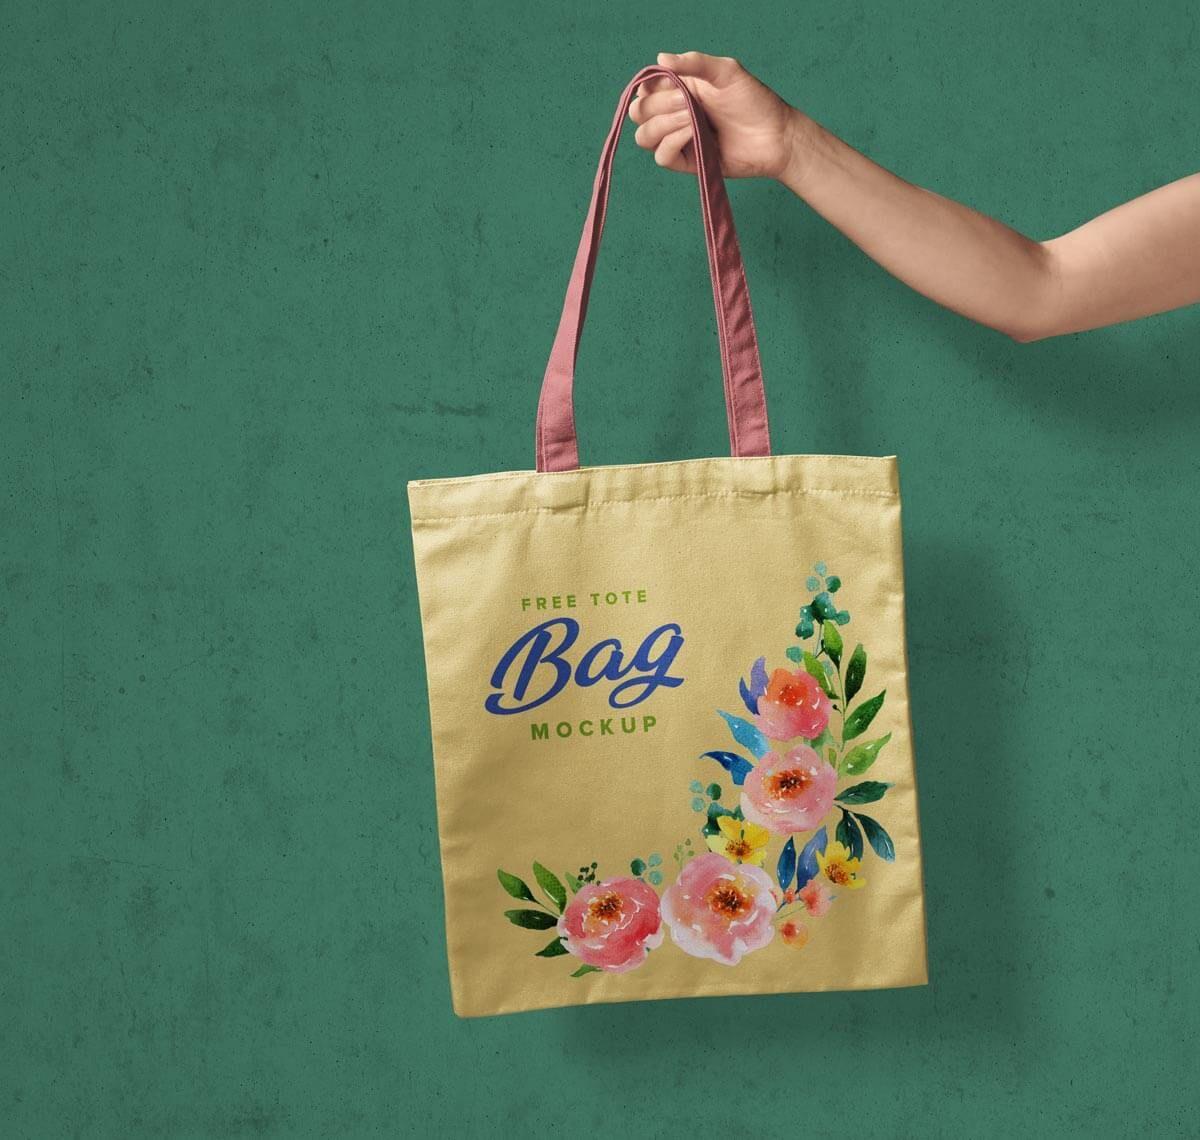 Download Free Hand Holding Tote Shopping Bag Mockup Psd Designbolts In 2020 Bag Mockup Bags Tote Bag